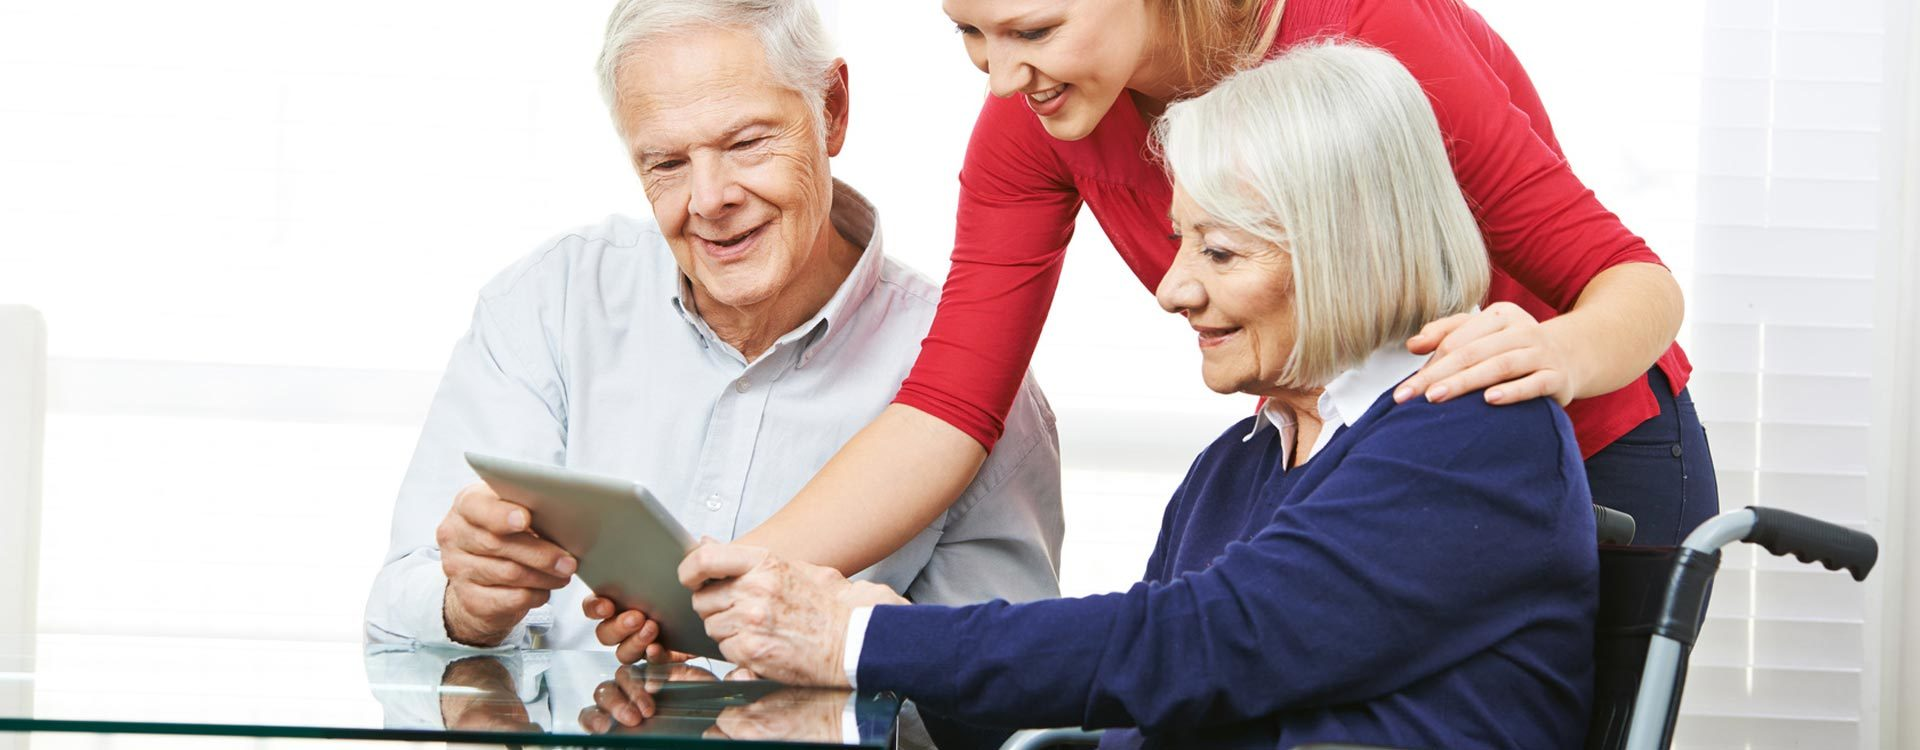 Älteres Ehepaar mit Tablet.